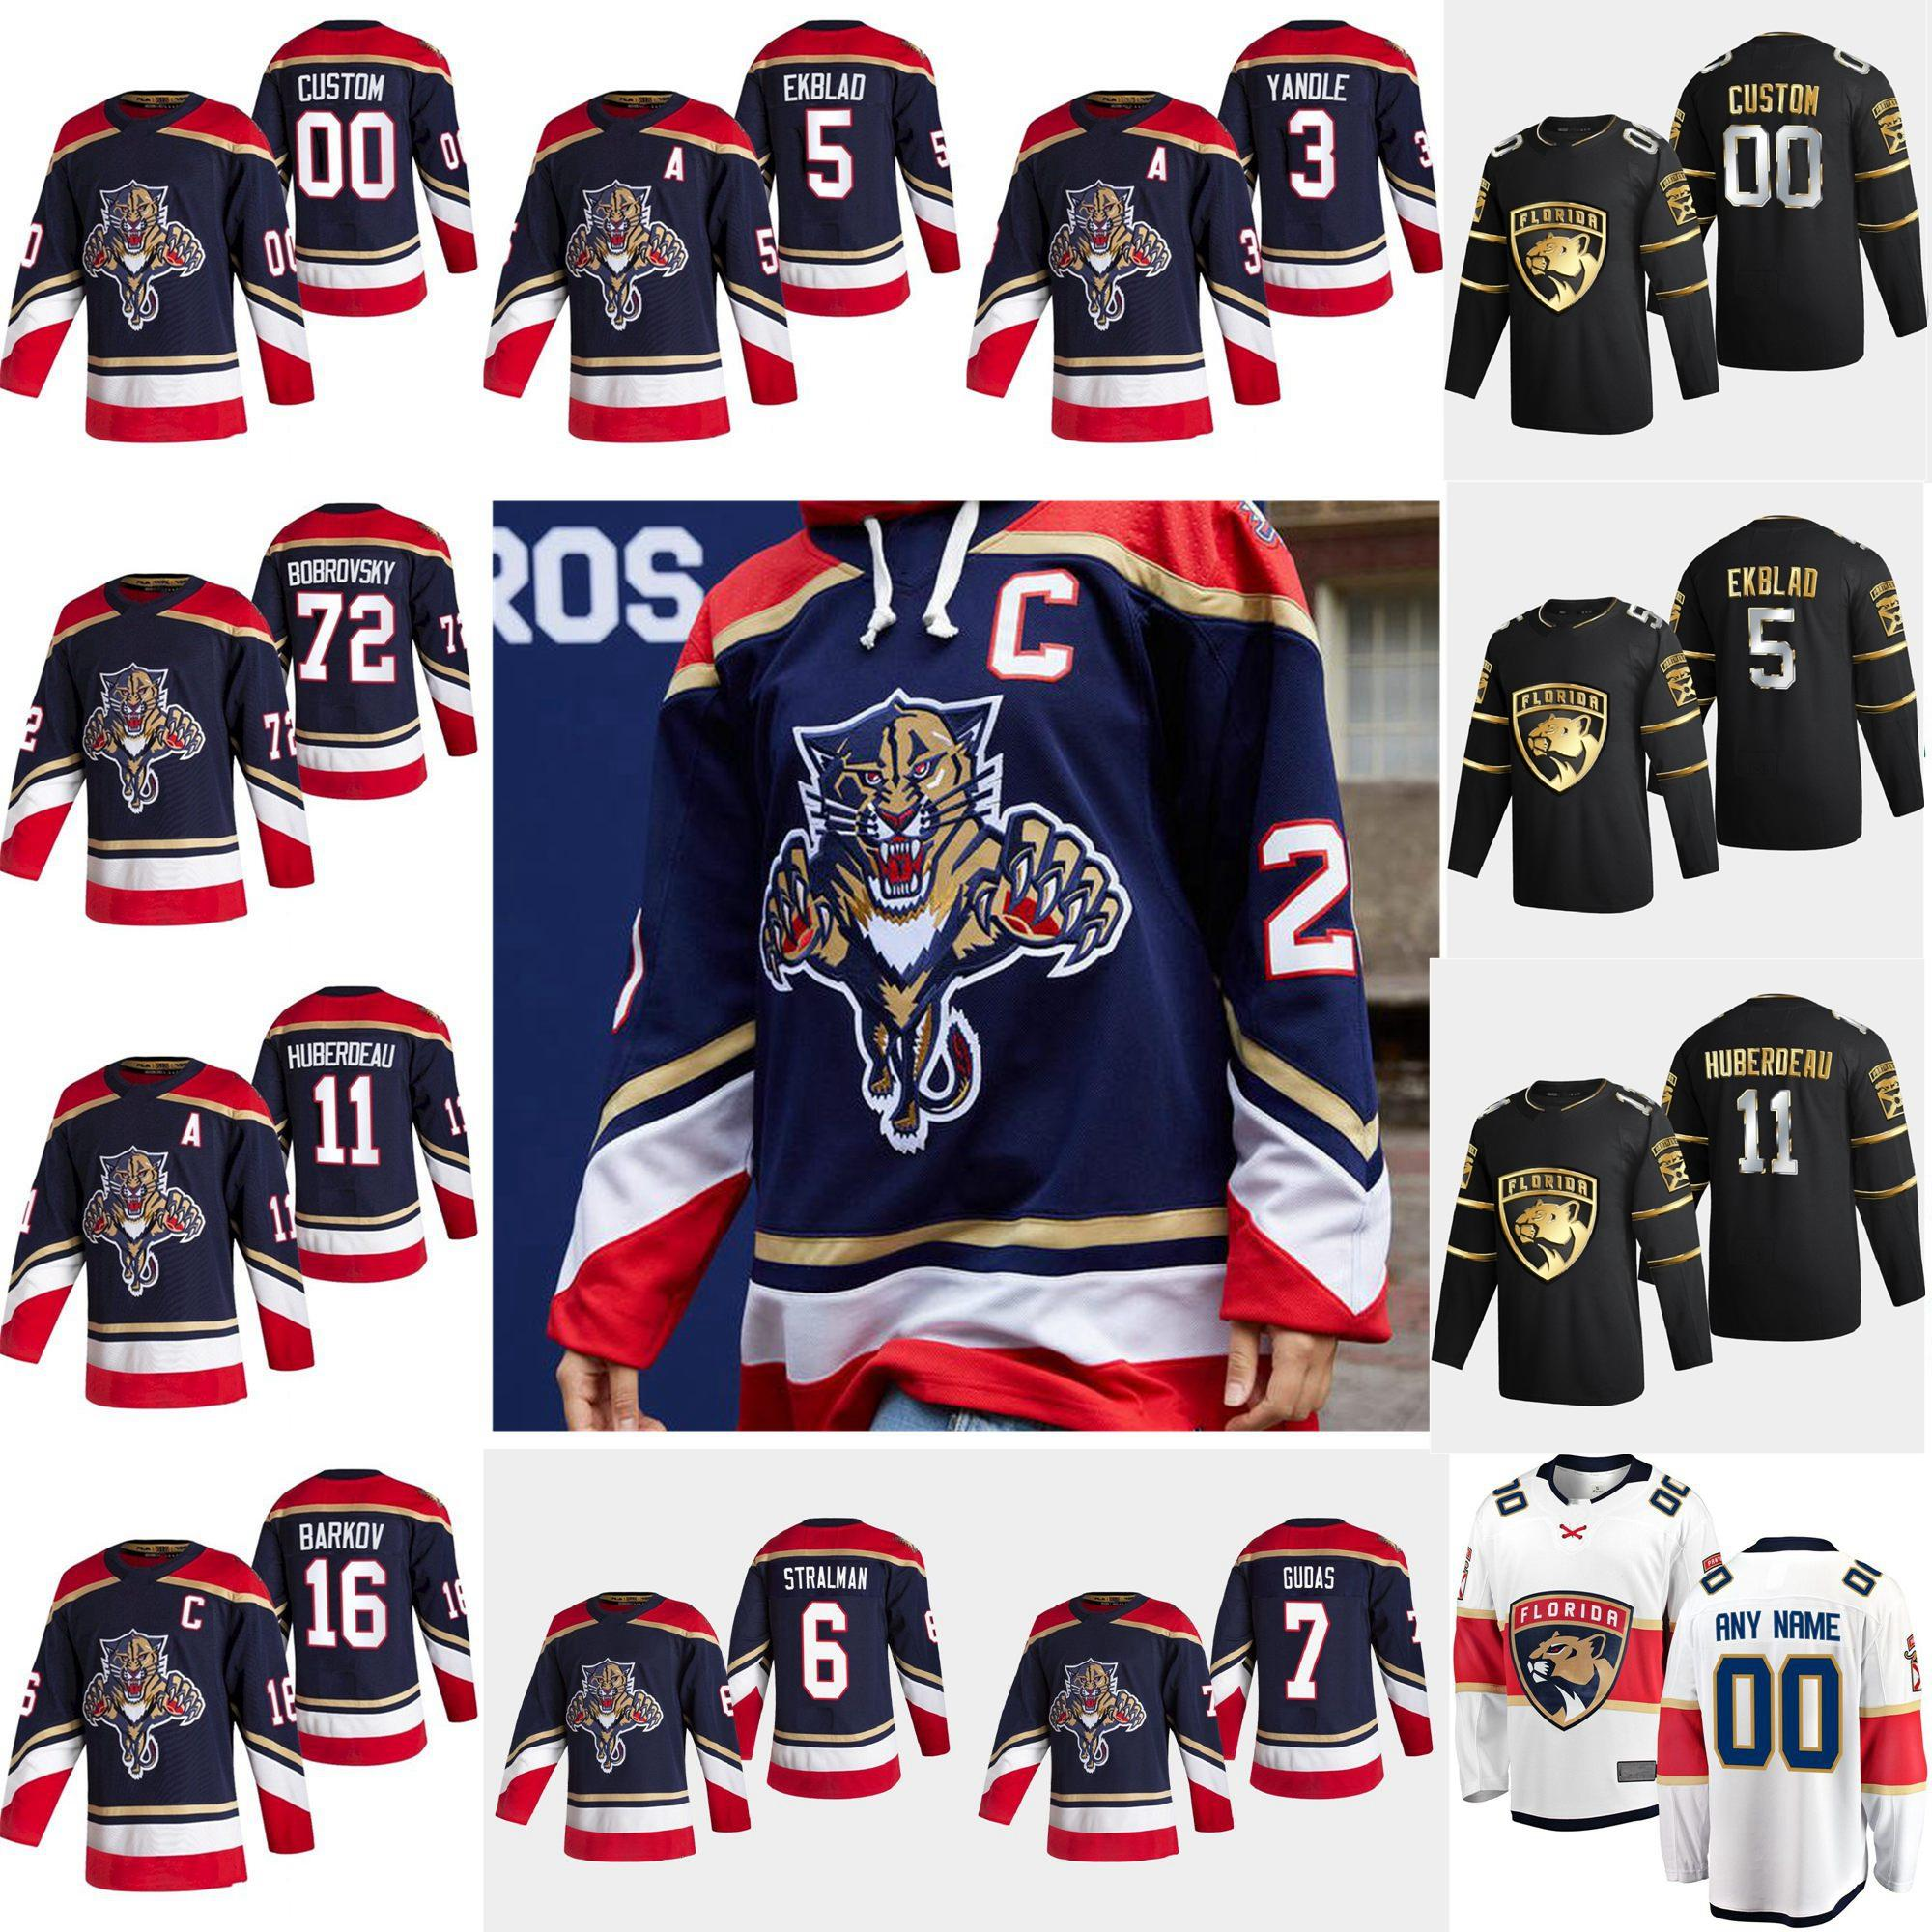 Florida Panthers 2021 inversa Retro Hockey Jerseys 72 Sergei Bobrovsky Aaron Ekblad Aleksander Barkov Jonathan Huberdeau cosido